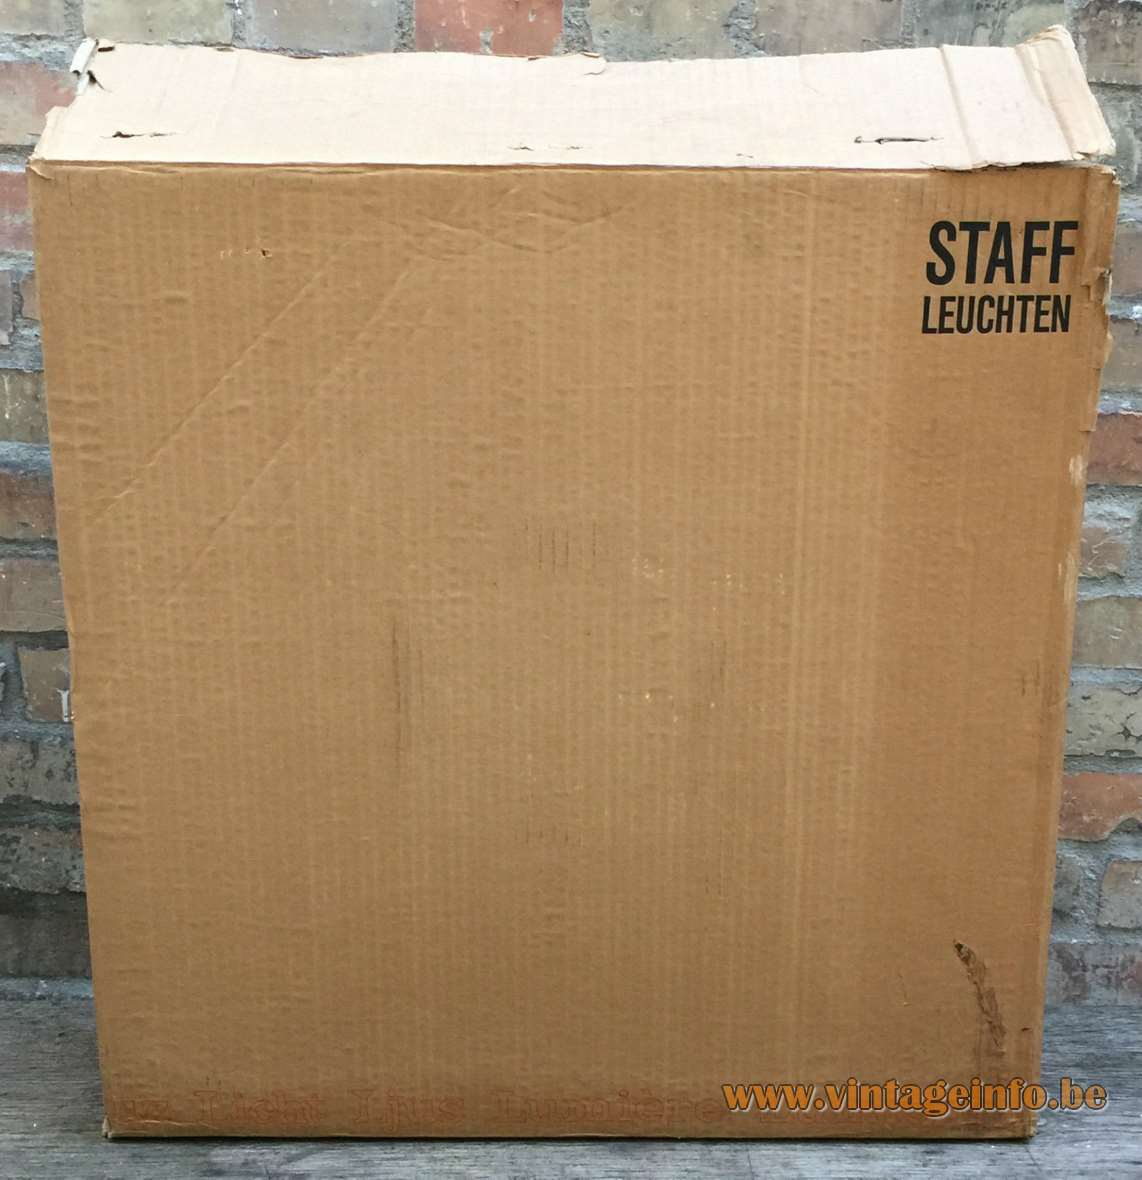 Staff Oyster Box